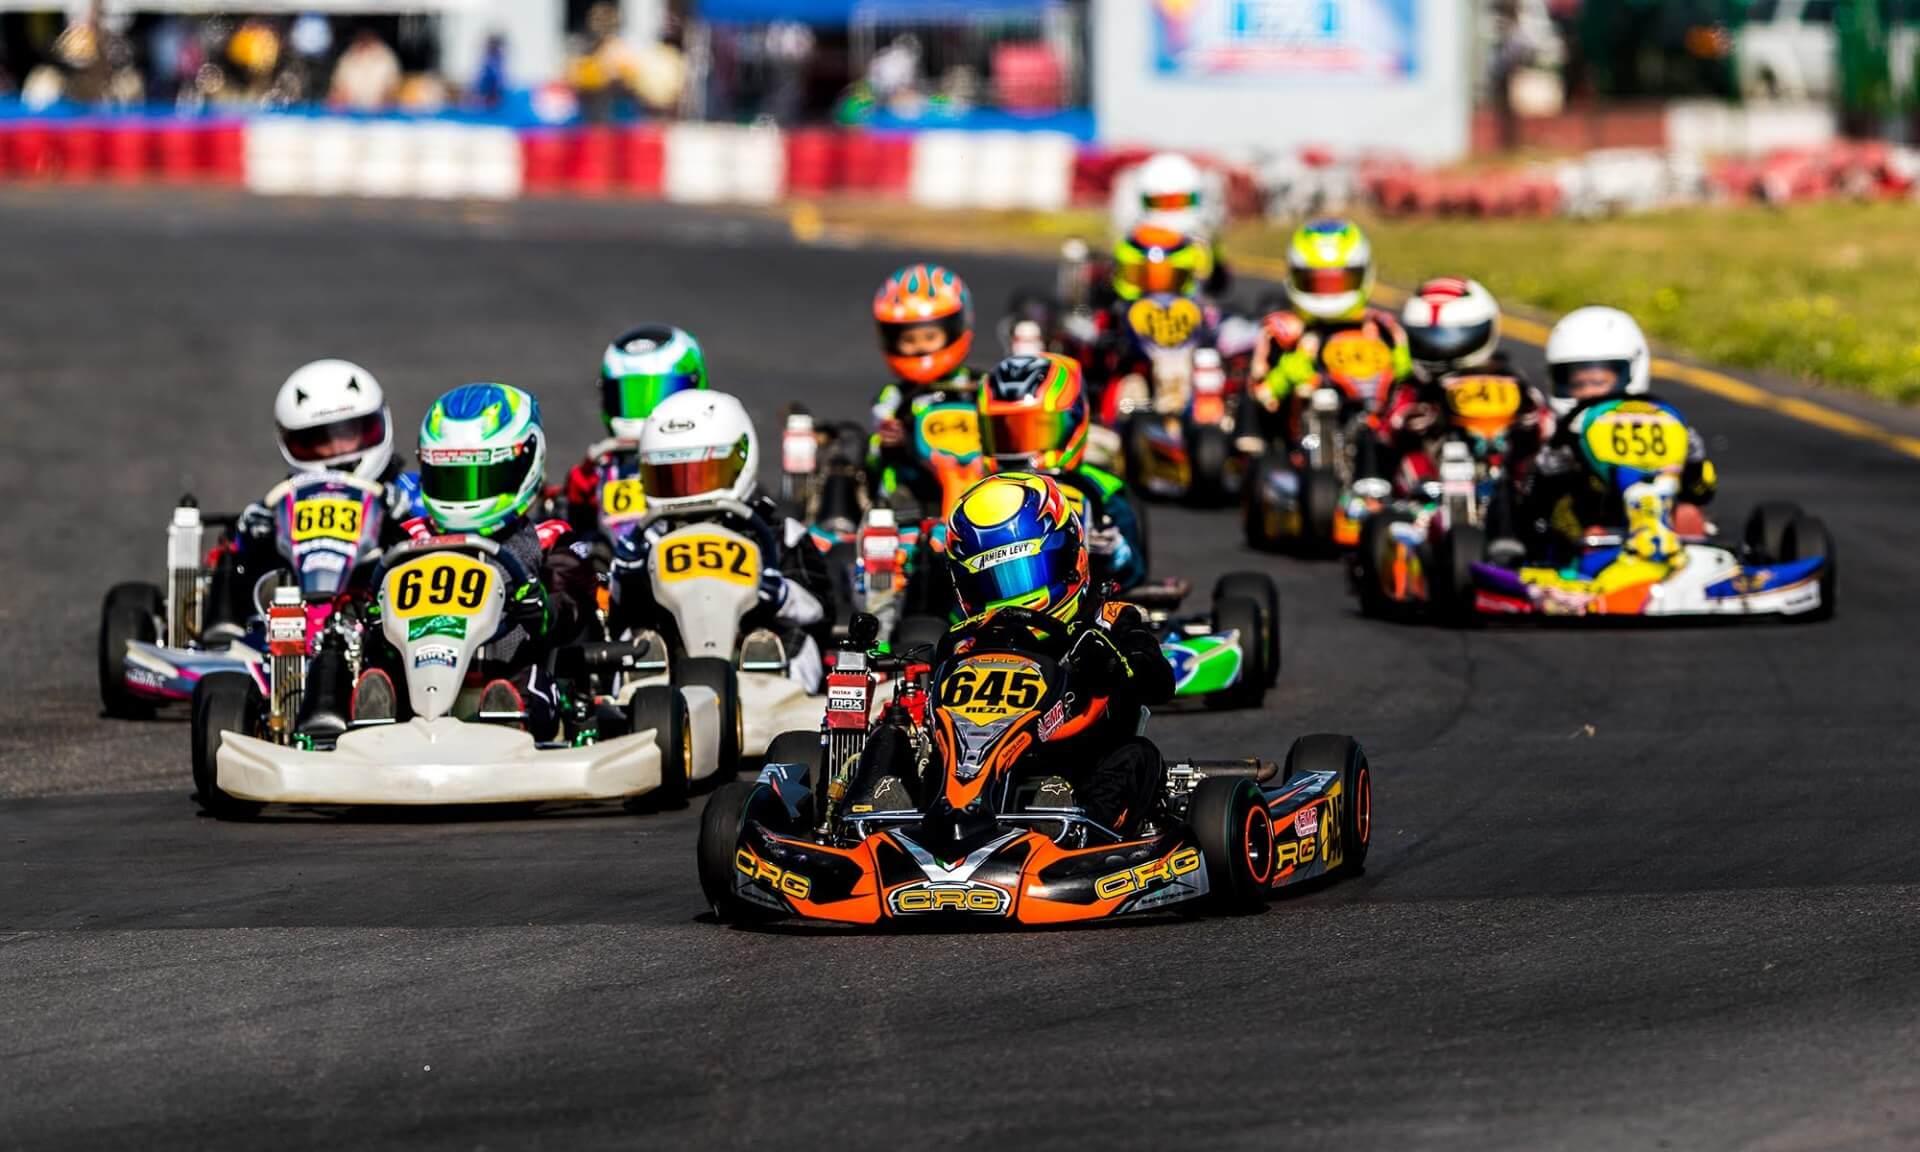 Hot Heads in Motorsport